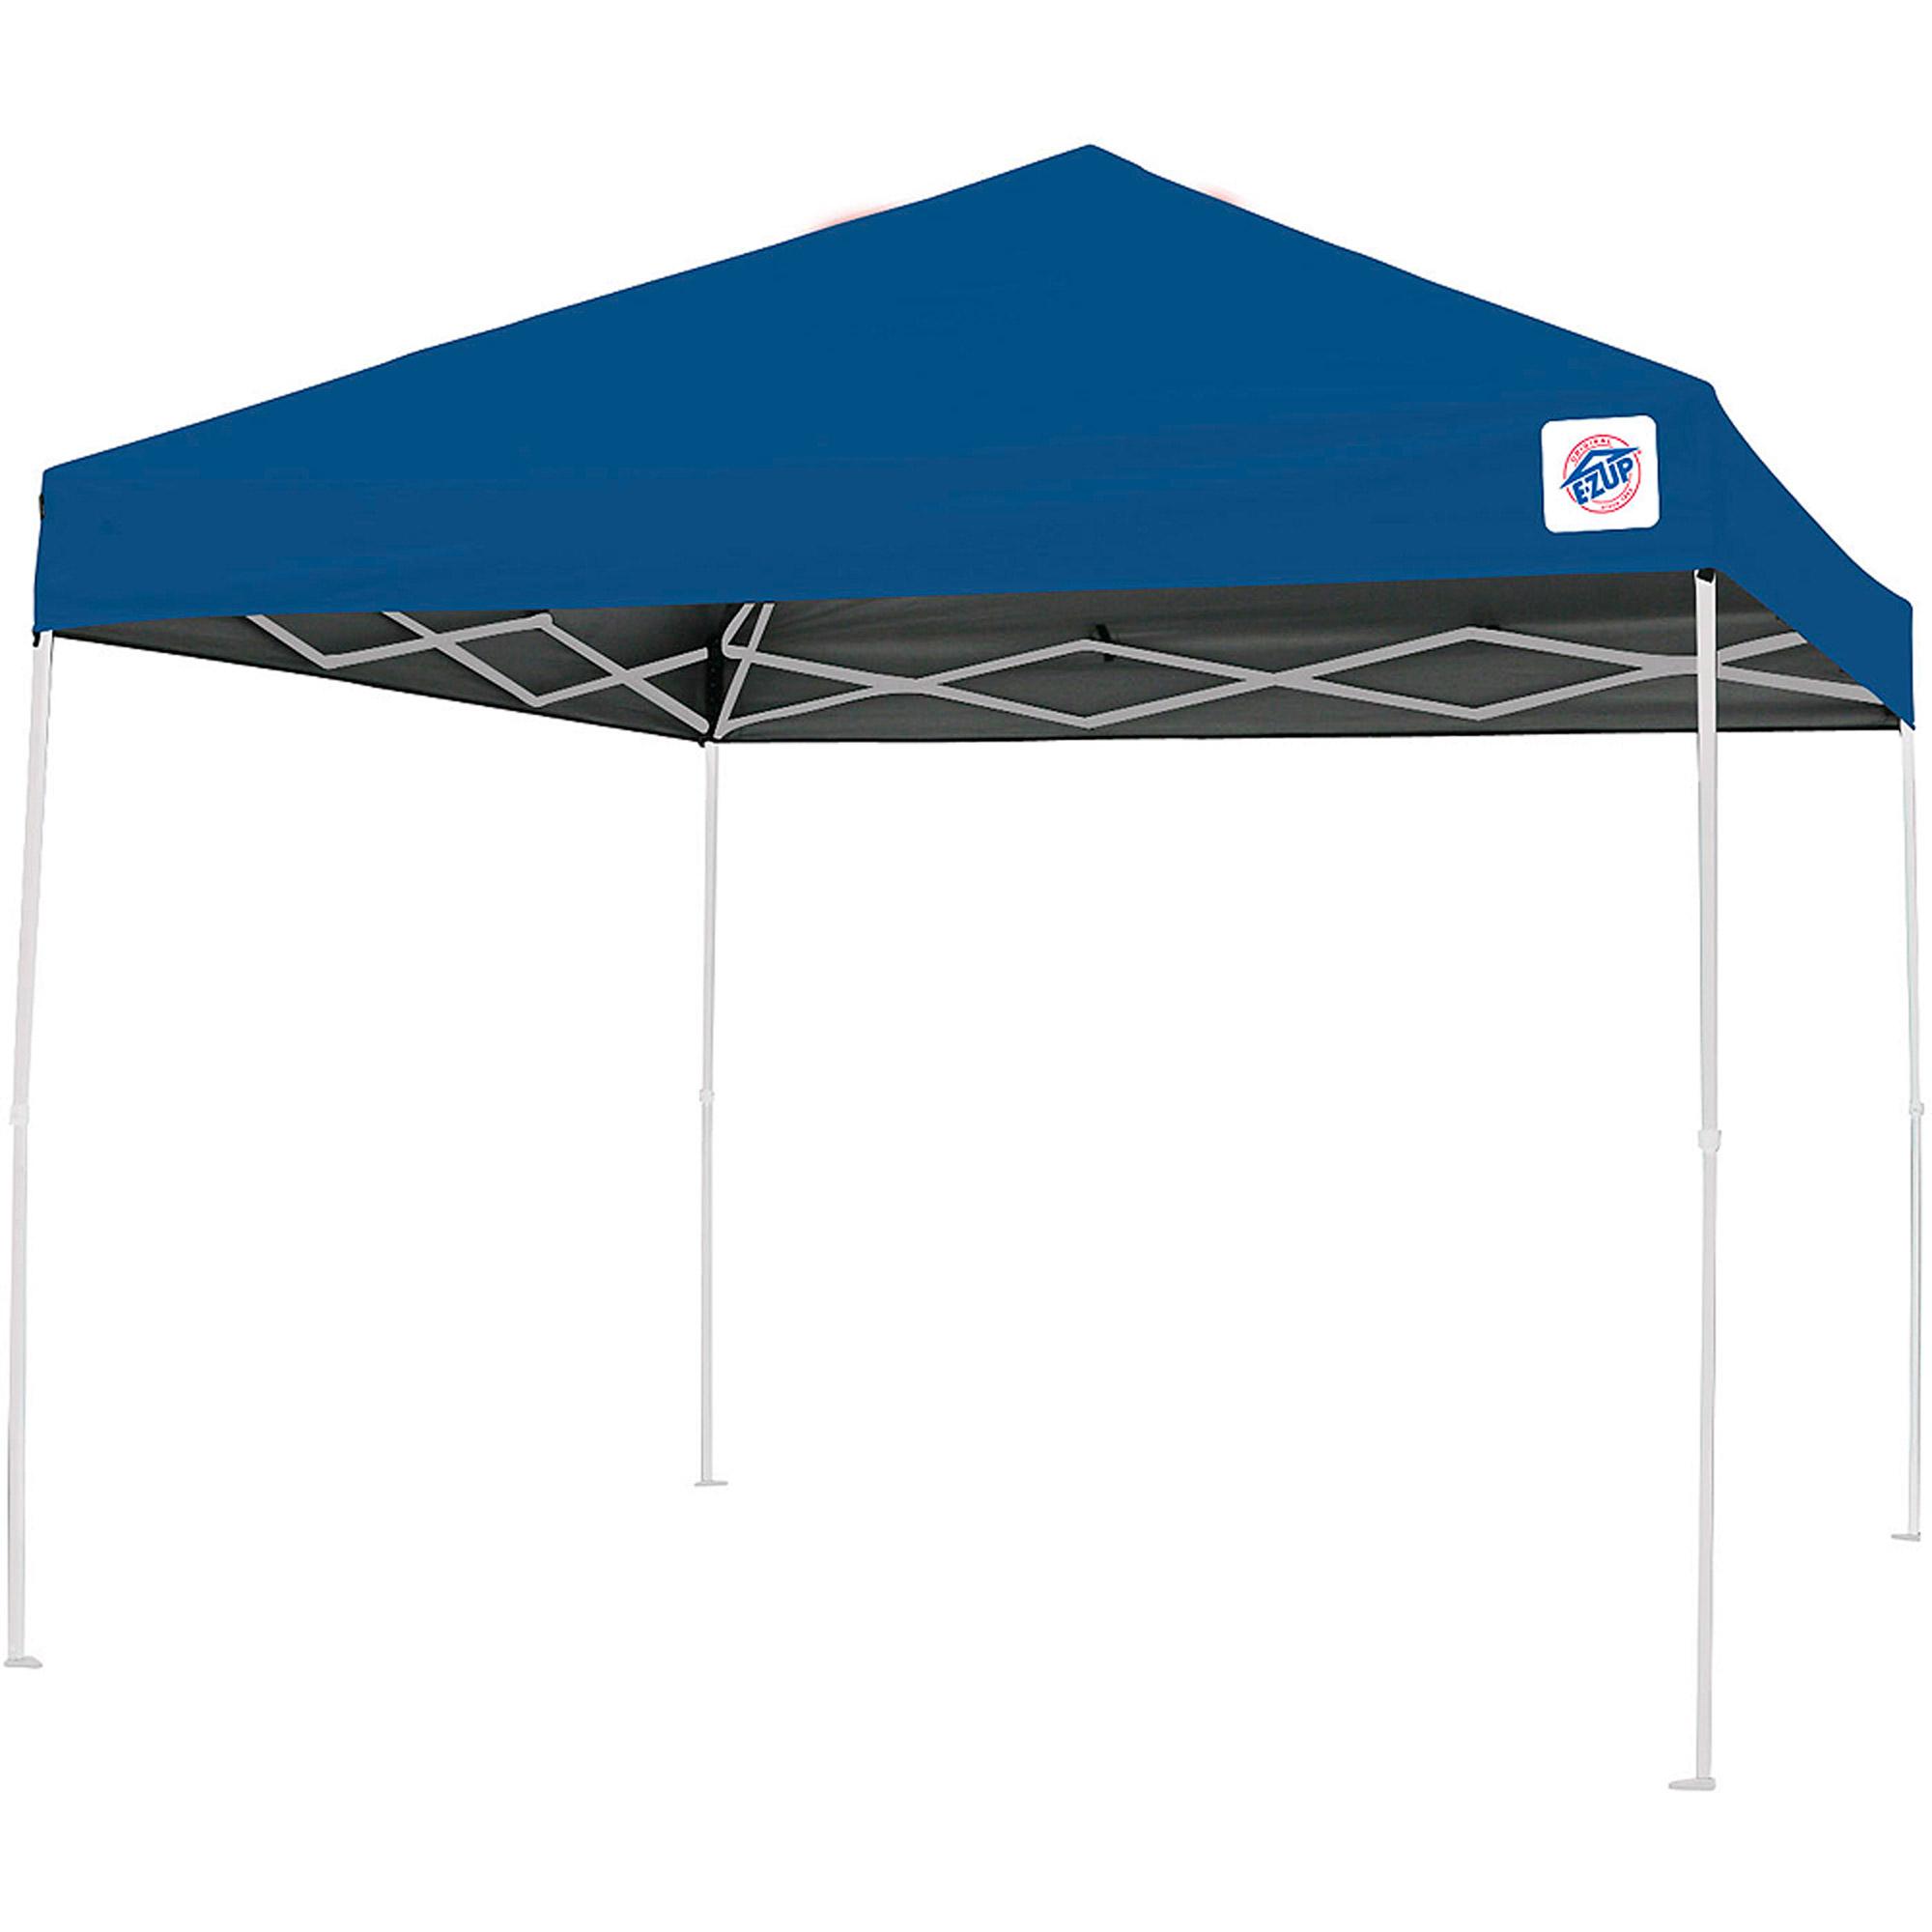 canopy tent palm springs 10u0027 x 30u0027 party tent wedding canopy gazebo pavilion w/side  walls - QAMTLPU